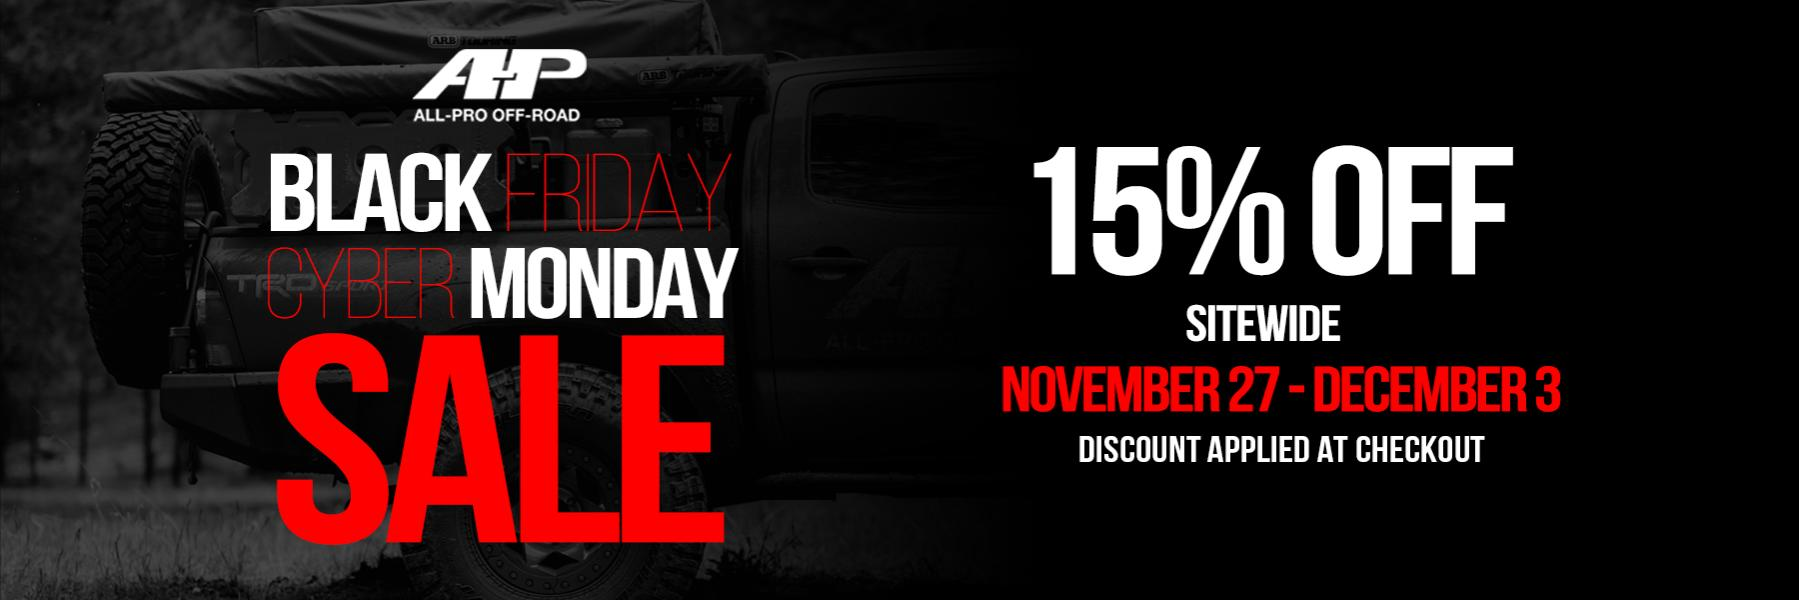 Wheeler's Off-Road Black Friday Sale 2019!-ap-black-friday-website-banner-jpg